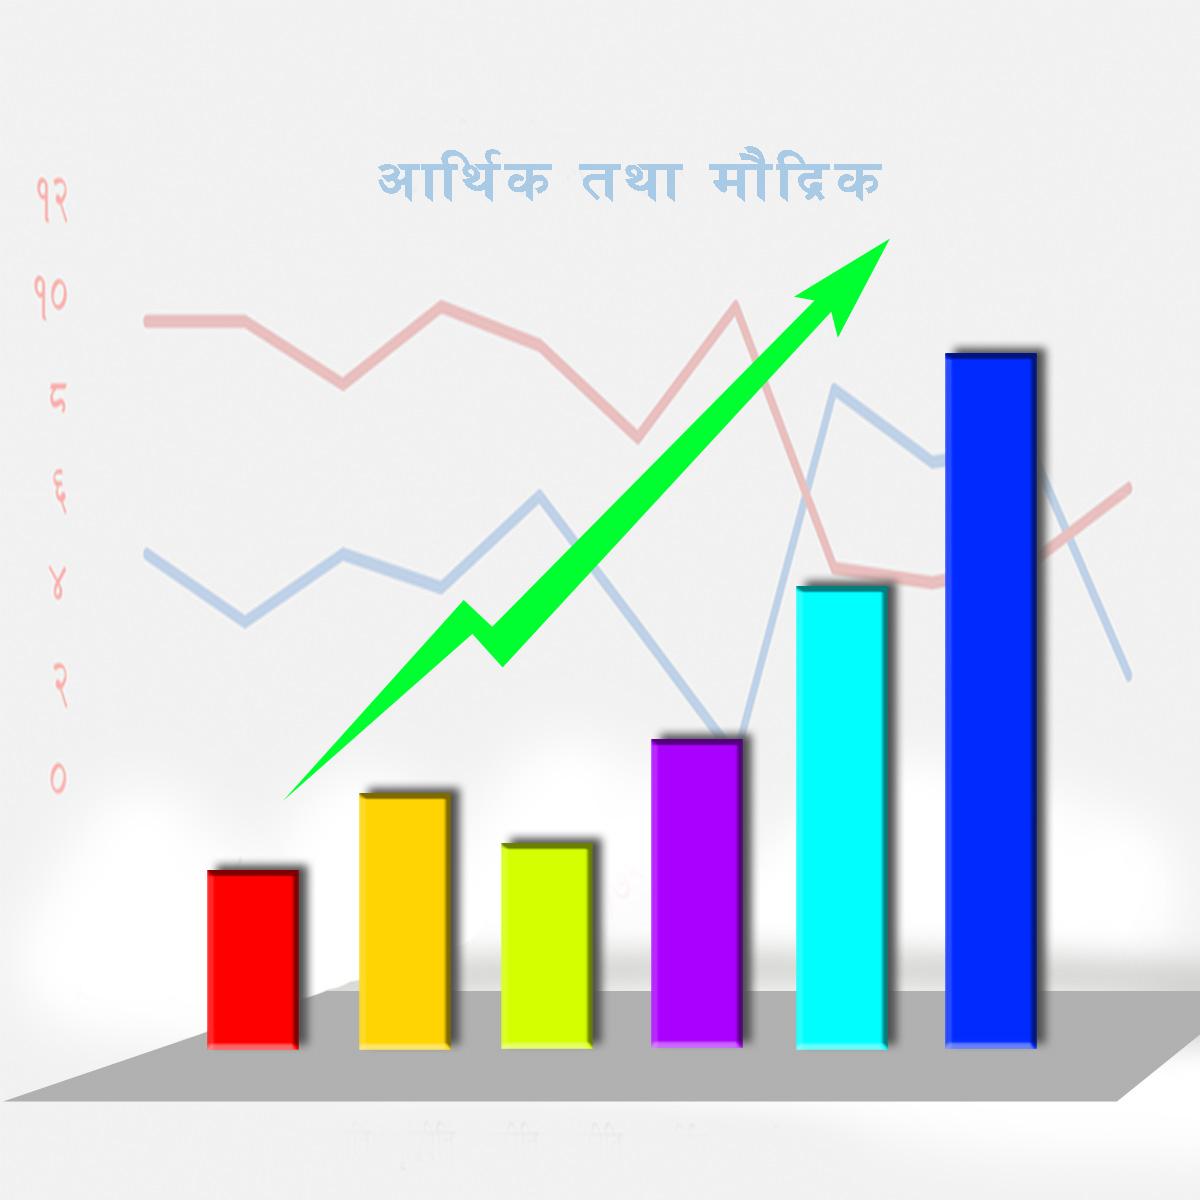 मौद्रिक नीति तथा आर्थिक अनुसन्धान